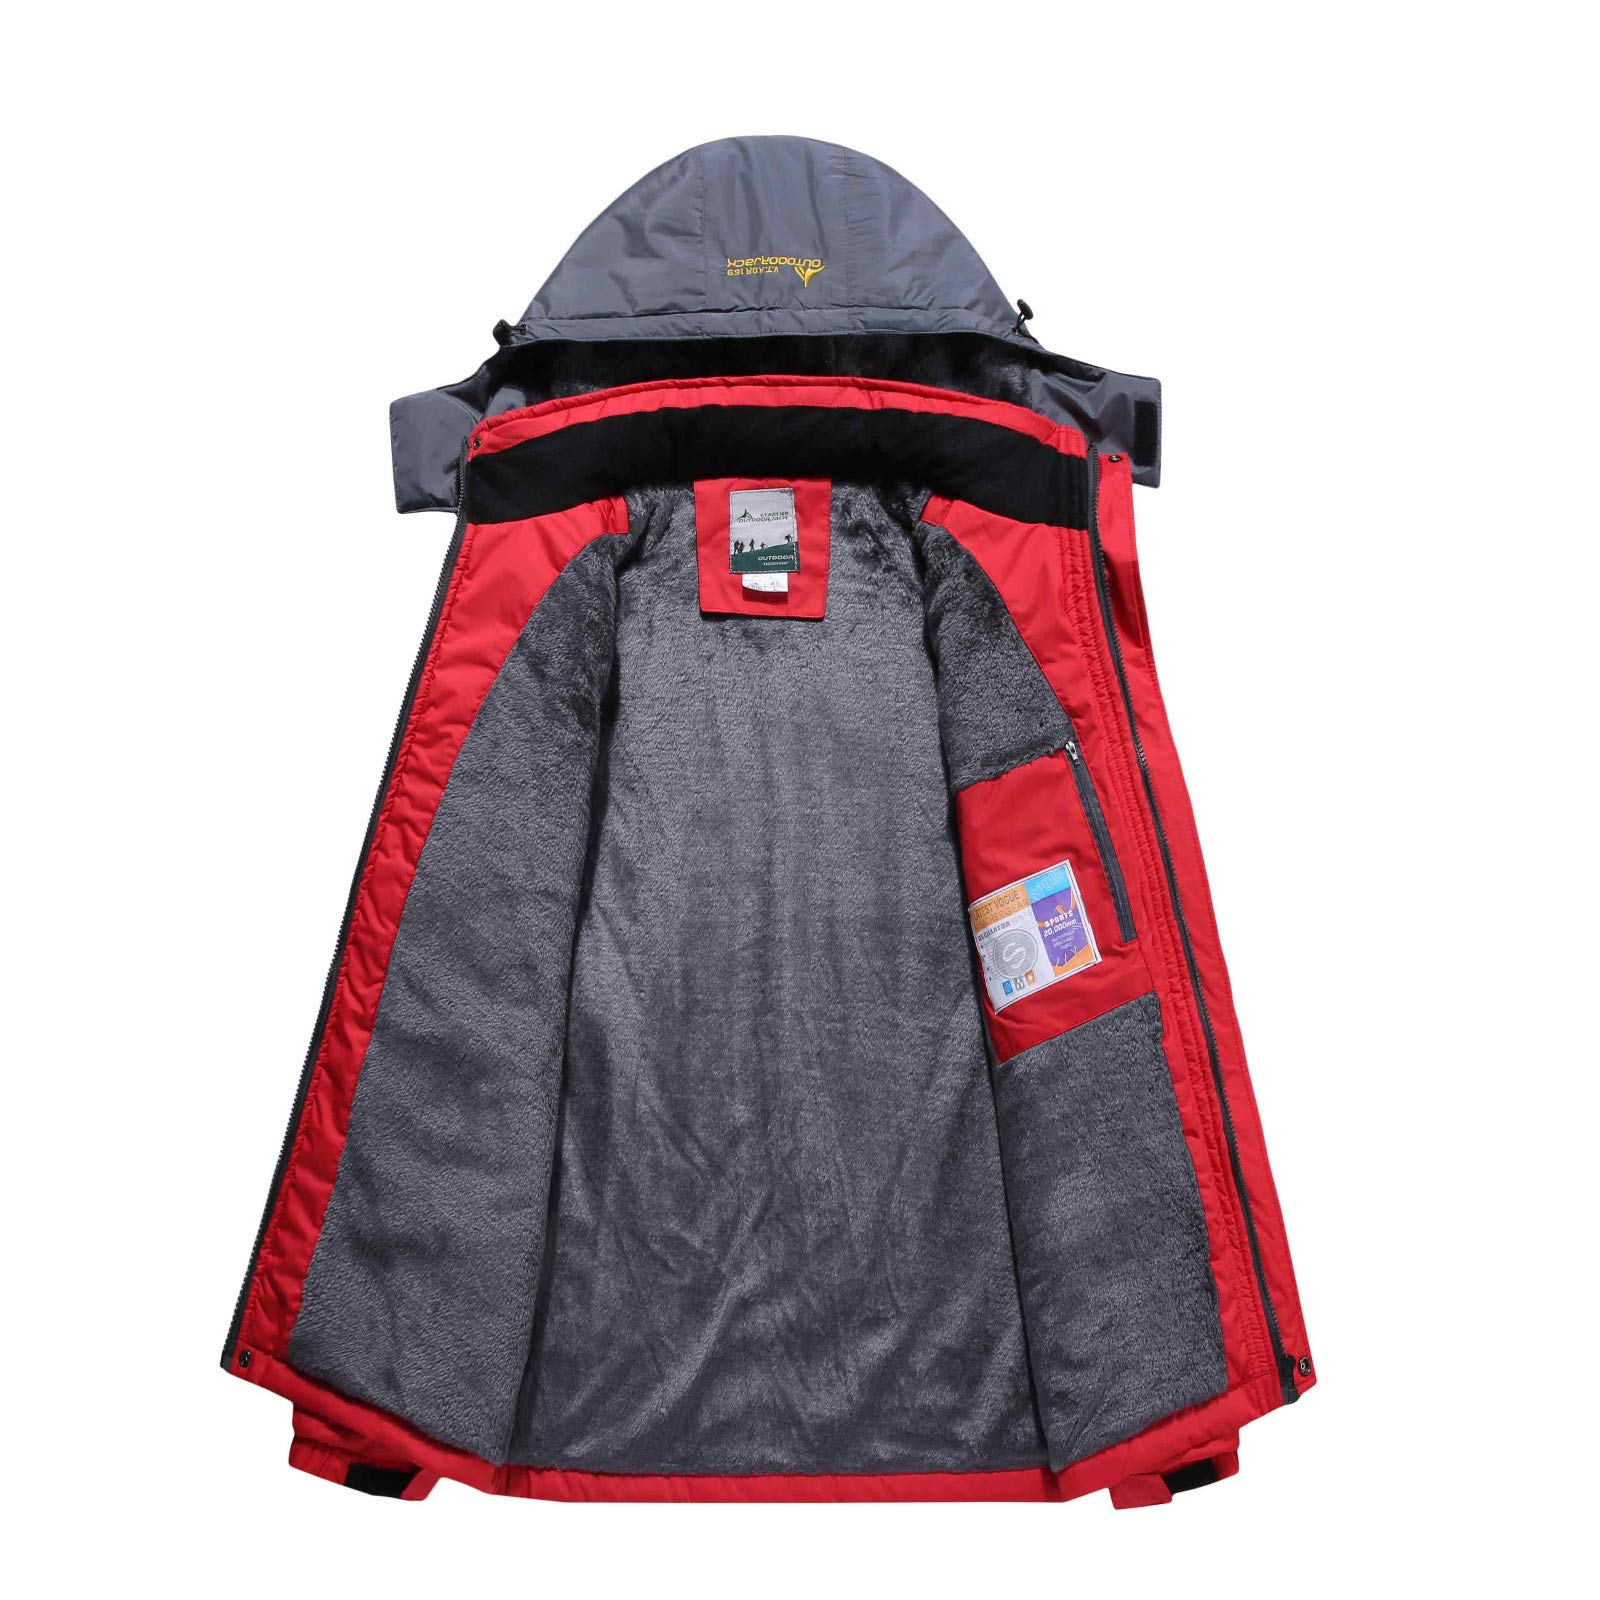 Men's Winter Jacket Outdoor Skiing Mountaineering Warm Windproof Clothes Waterproof Casual Sports Coat Red